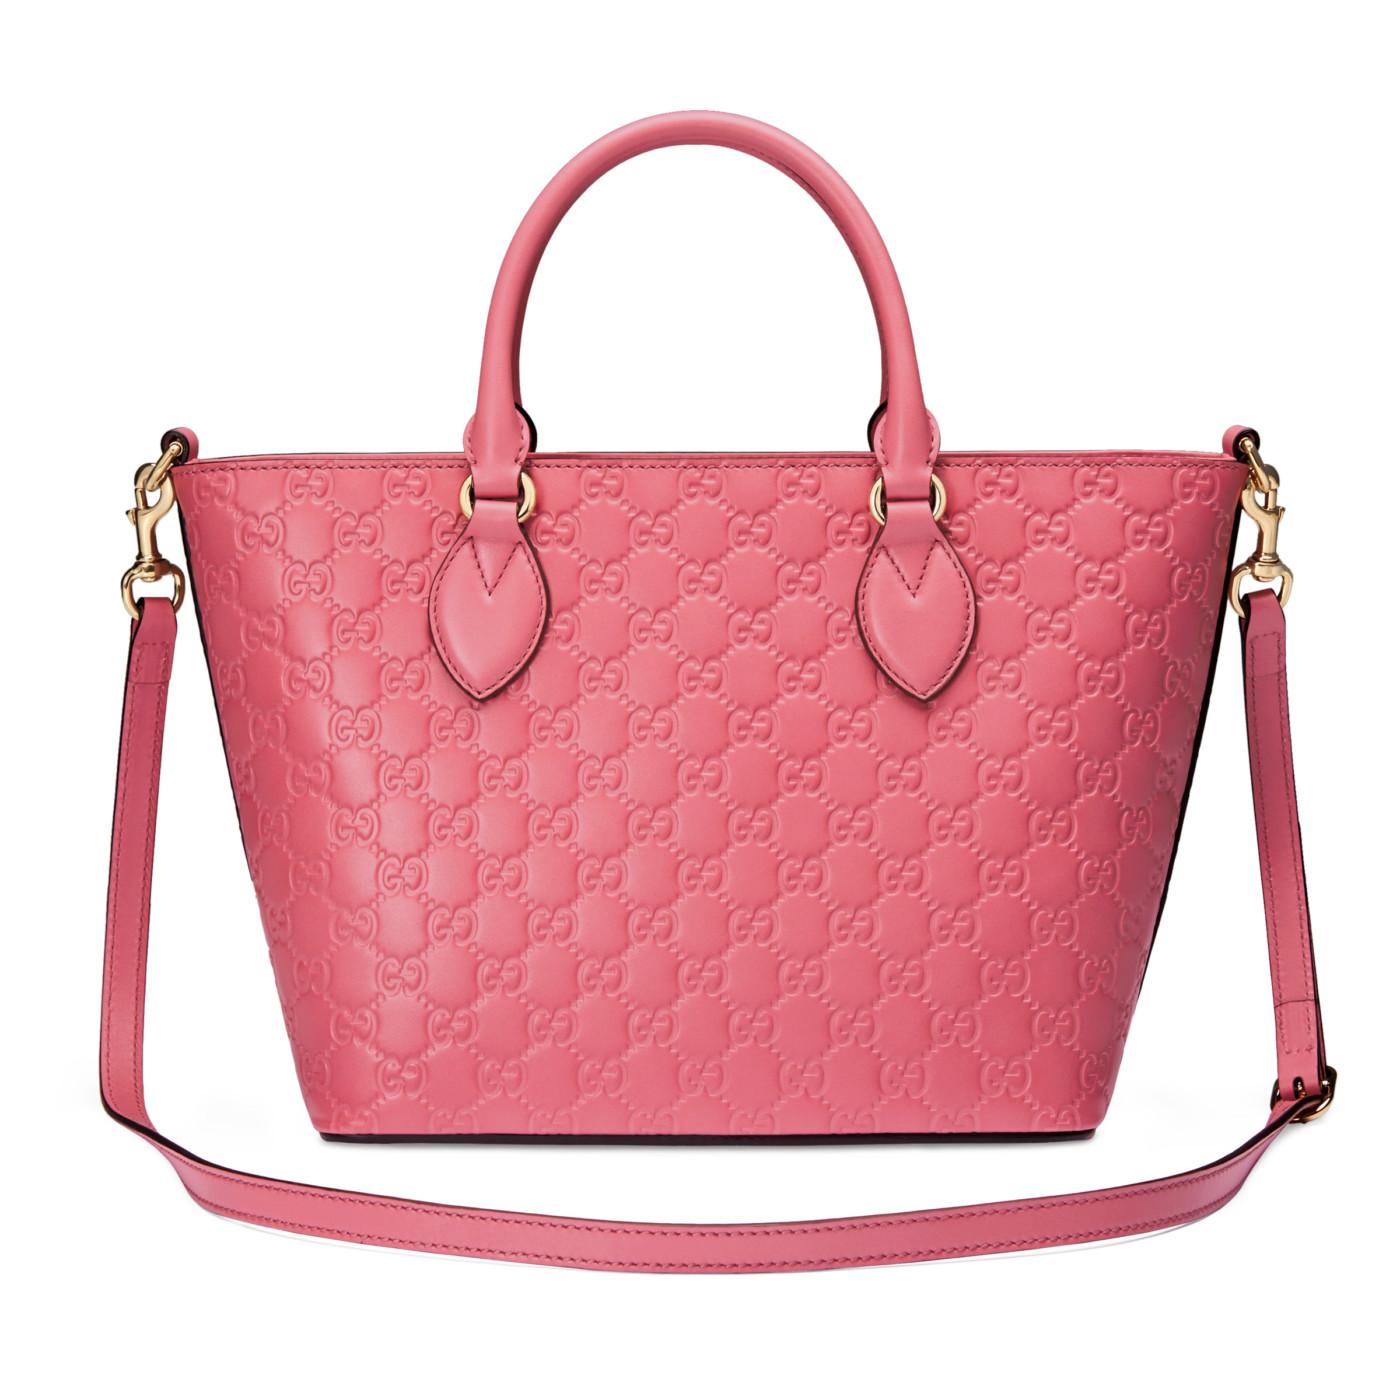 24052a8b5a382 Gucci Fuchsia Pink Leather GG Guccissima Signature Tote Satchel Bag